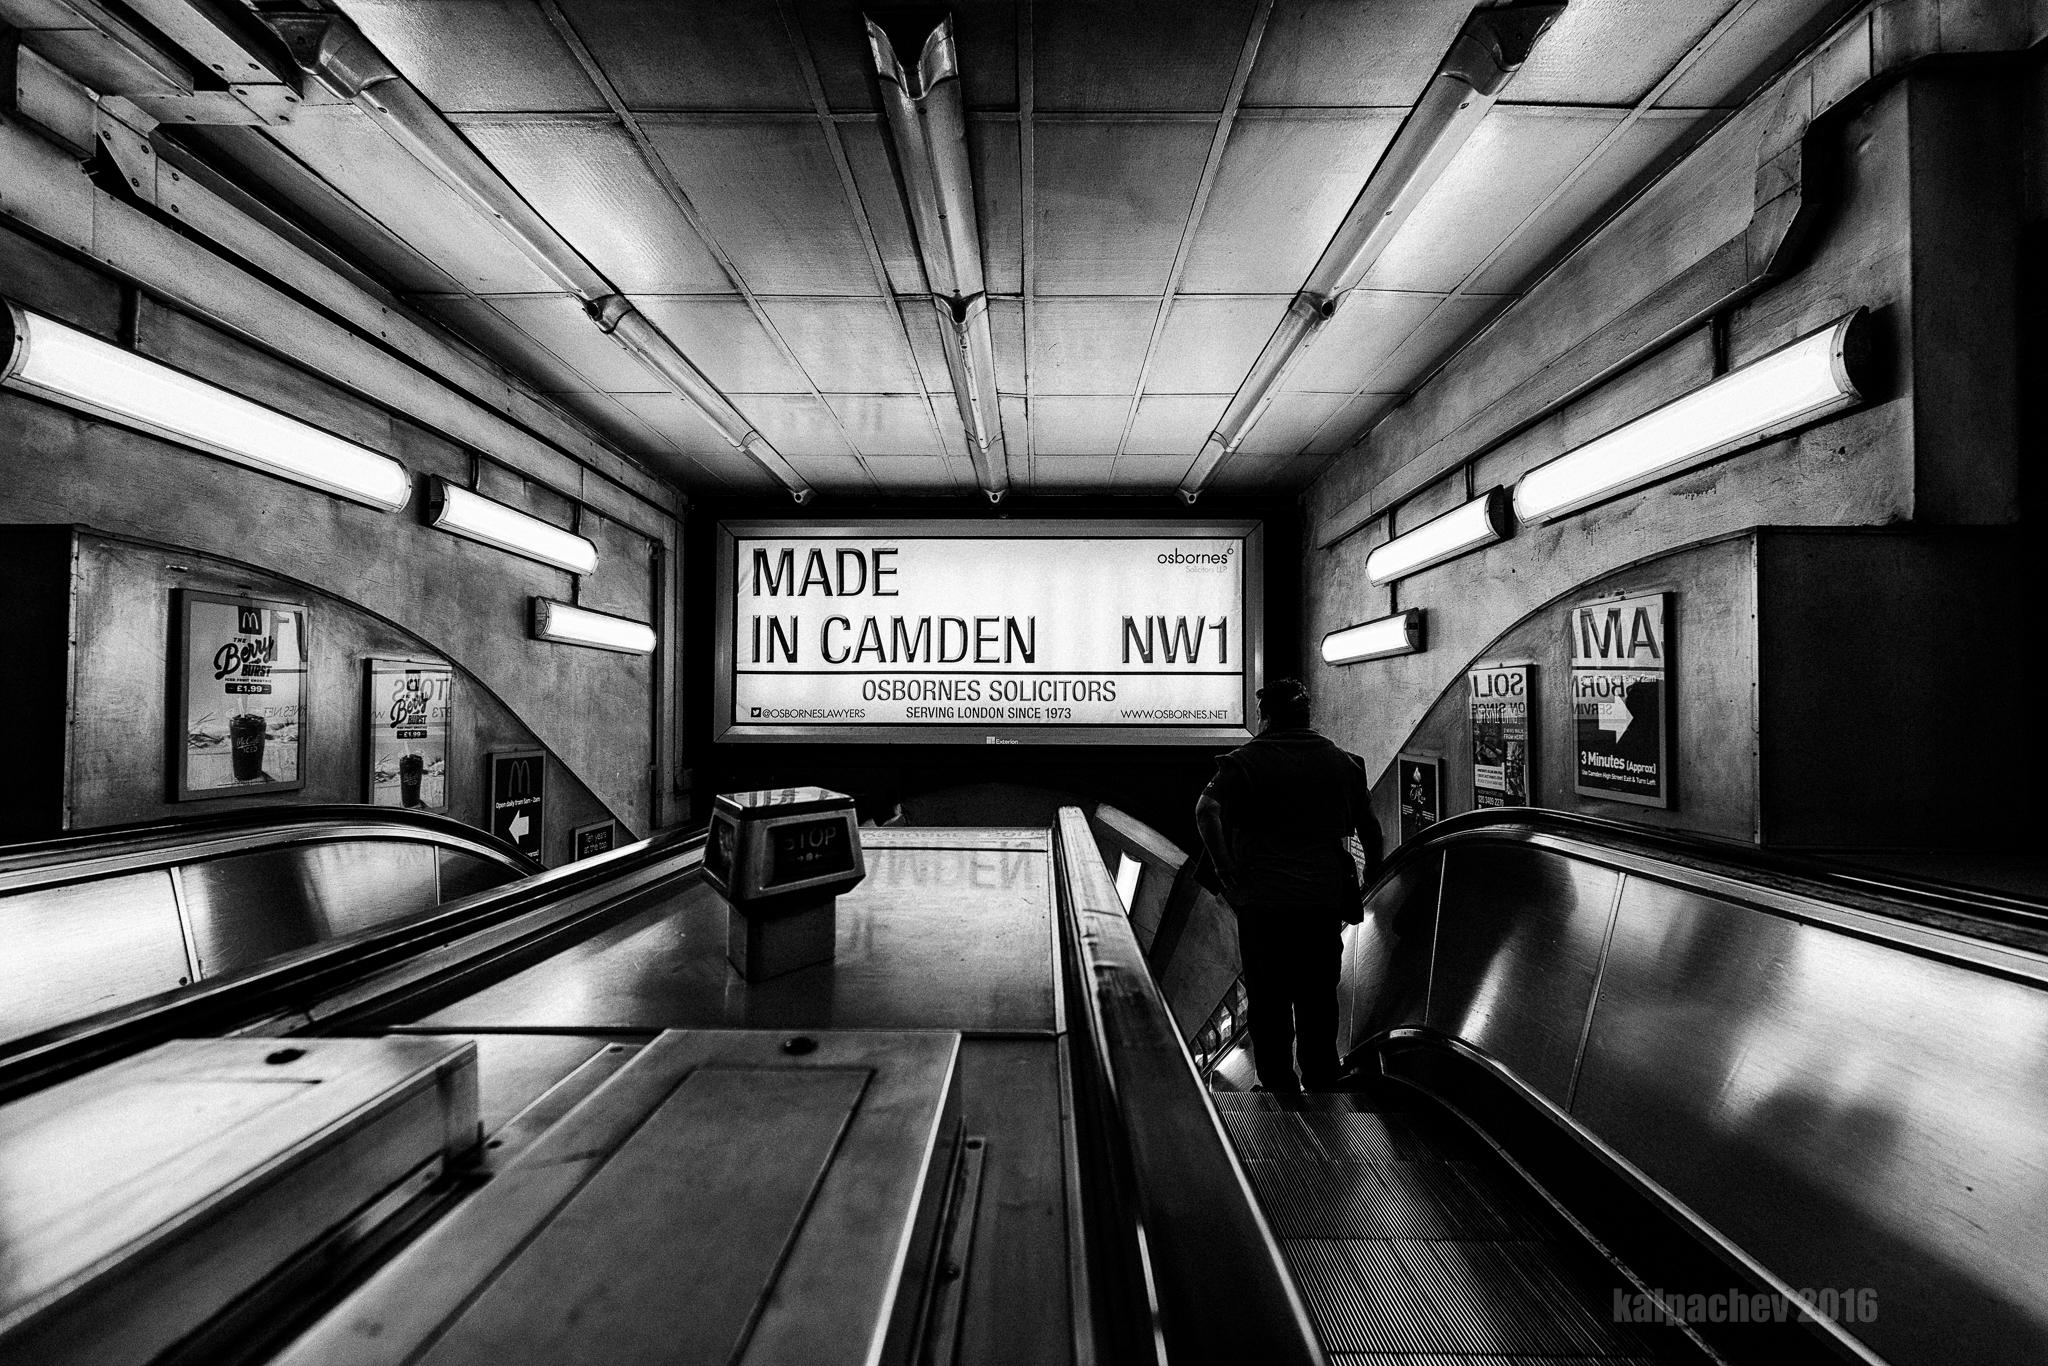 Made in Camden #camden #tfl #londonunderground